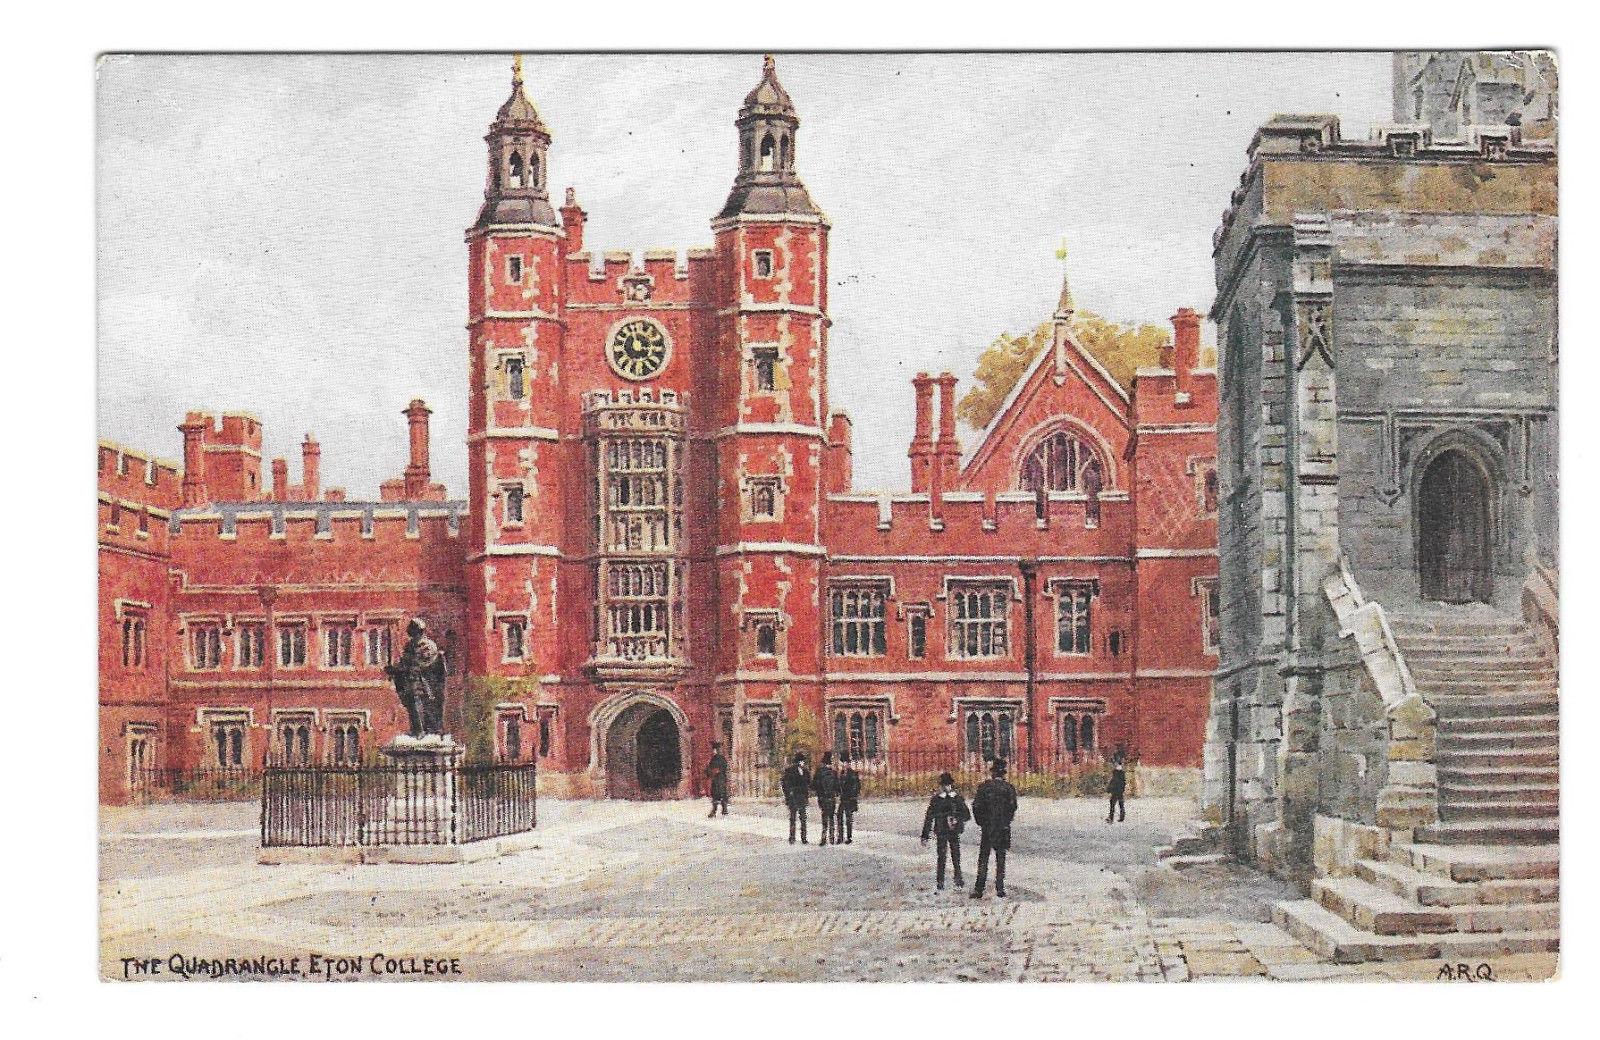 UK Eton College Quadrangle AR Quinton Painting Vtg Salmon Postcard England